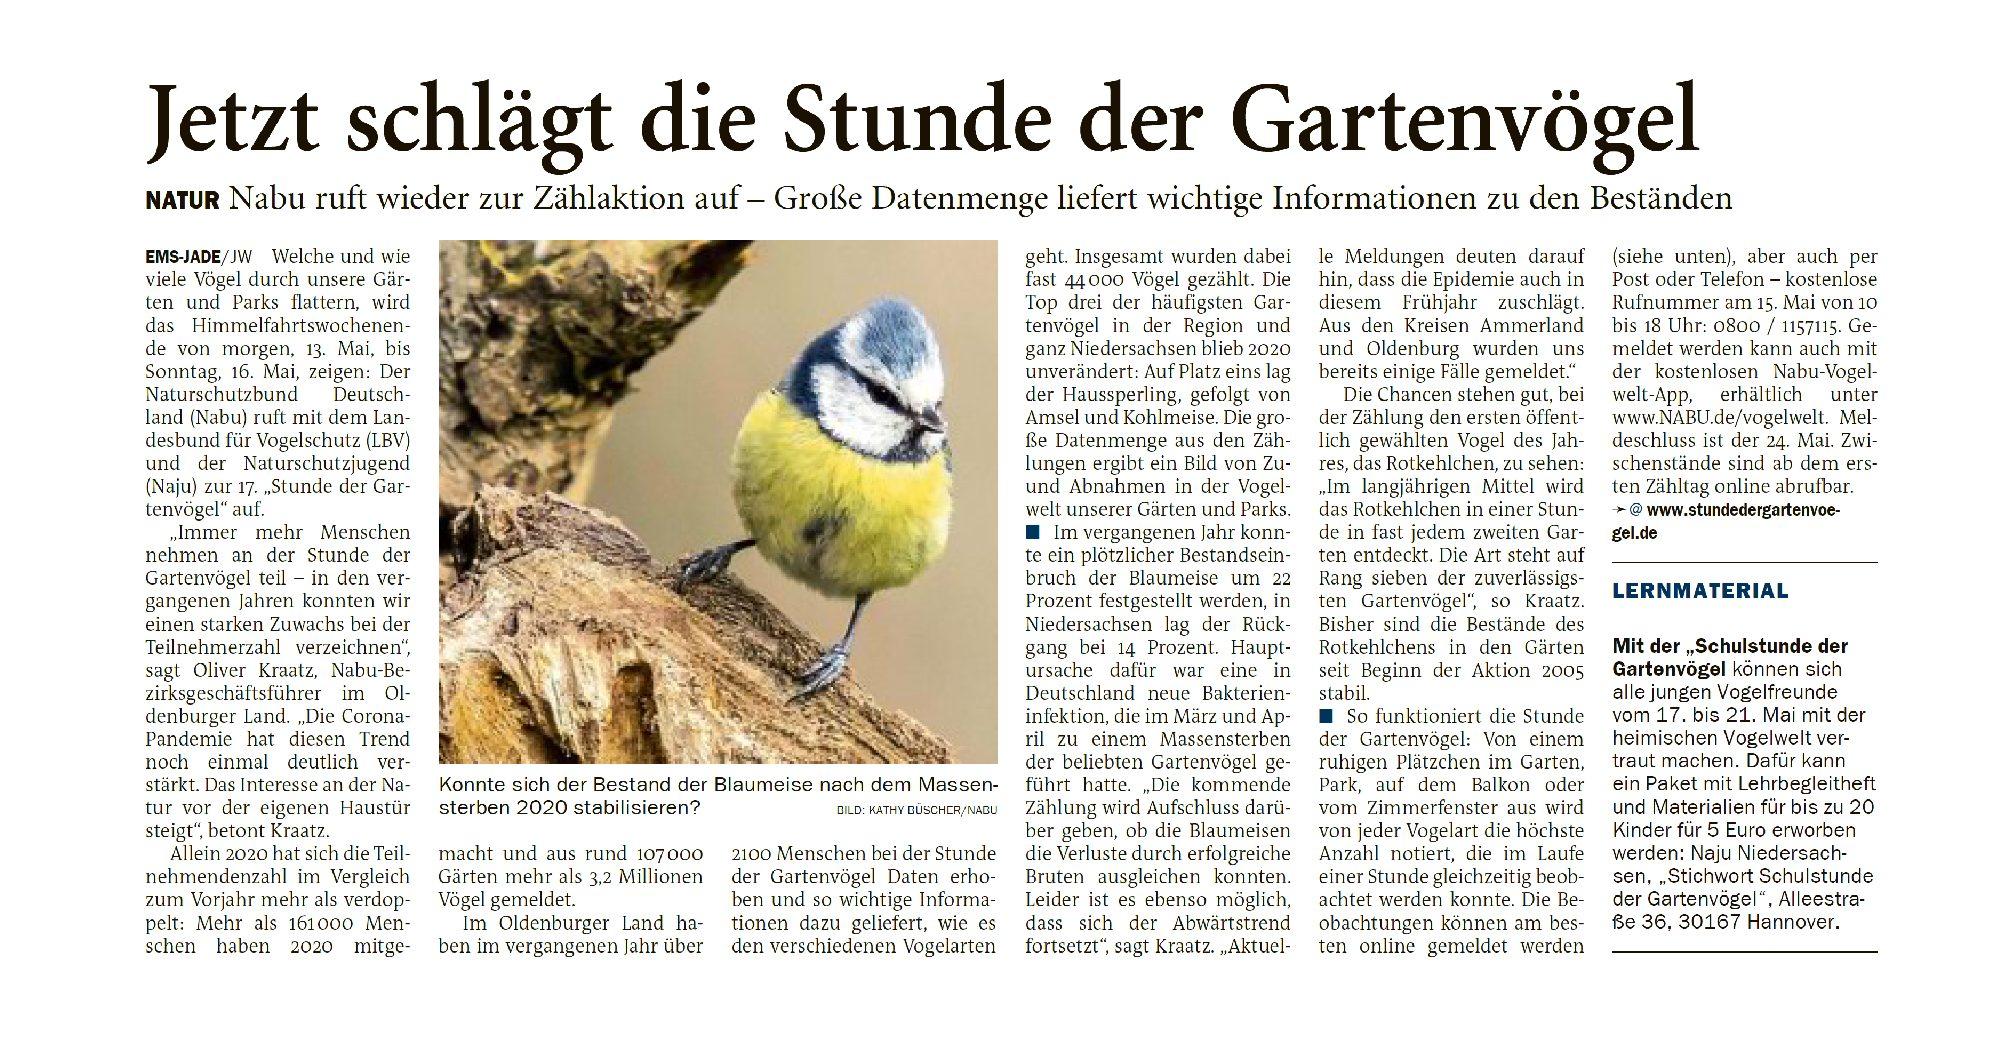 Jeversches Wochenblatt 12.05.2021 III